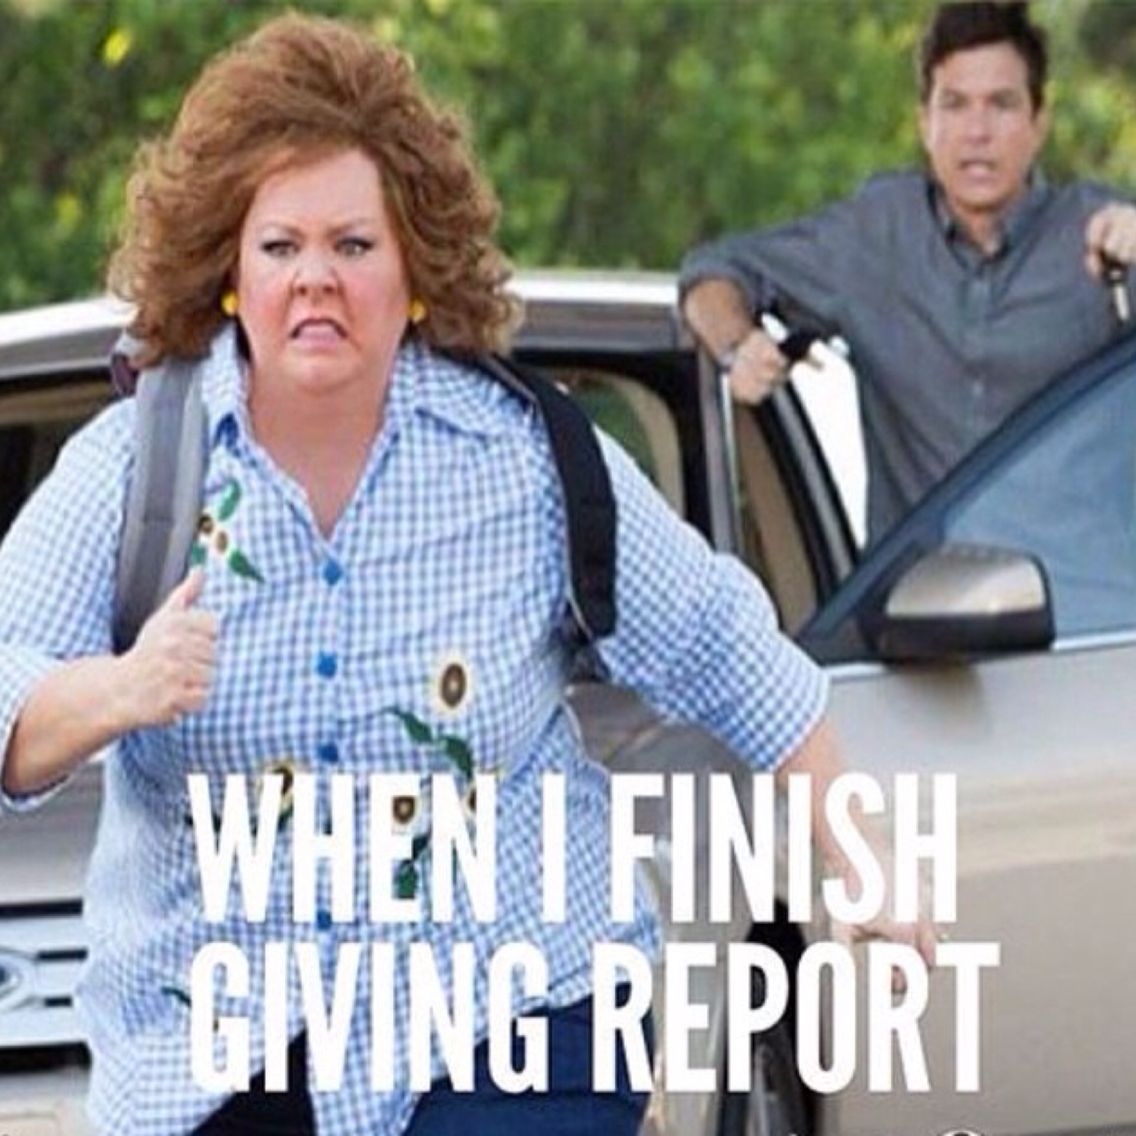 When I Finish Giving Report Nurse Humor Peace Out Nursing Problems Nurse Humor Nursing Fun Hospital Humor